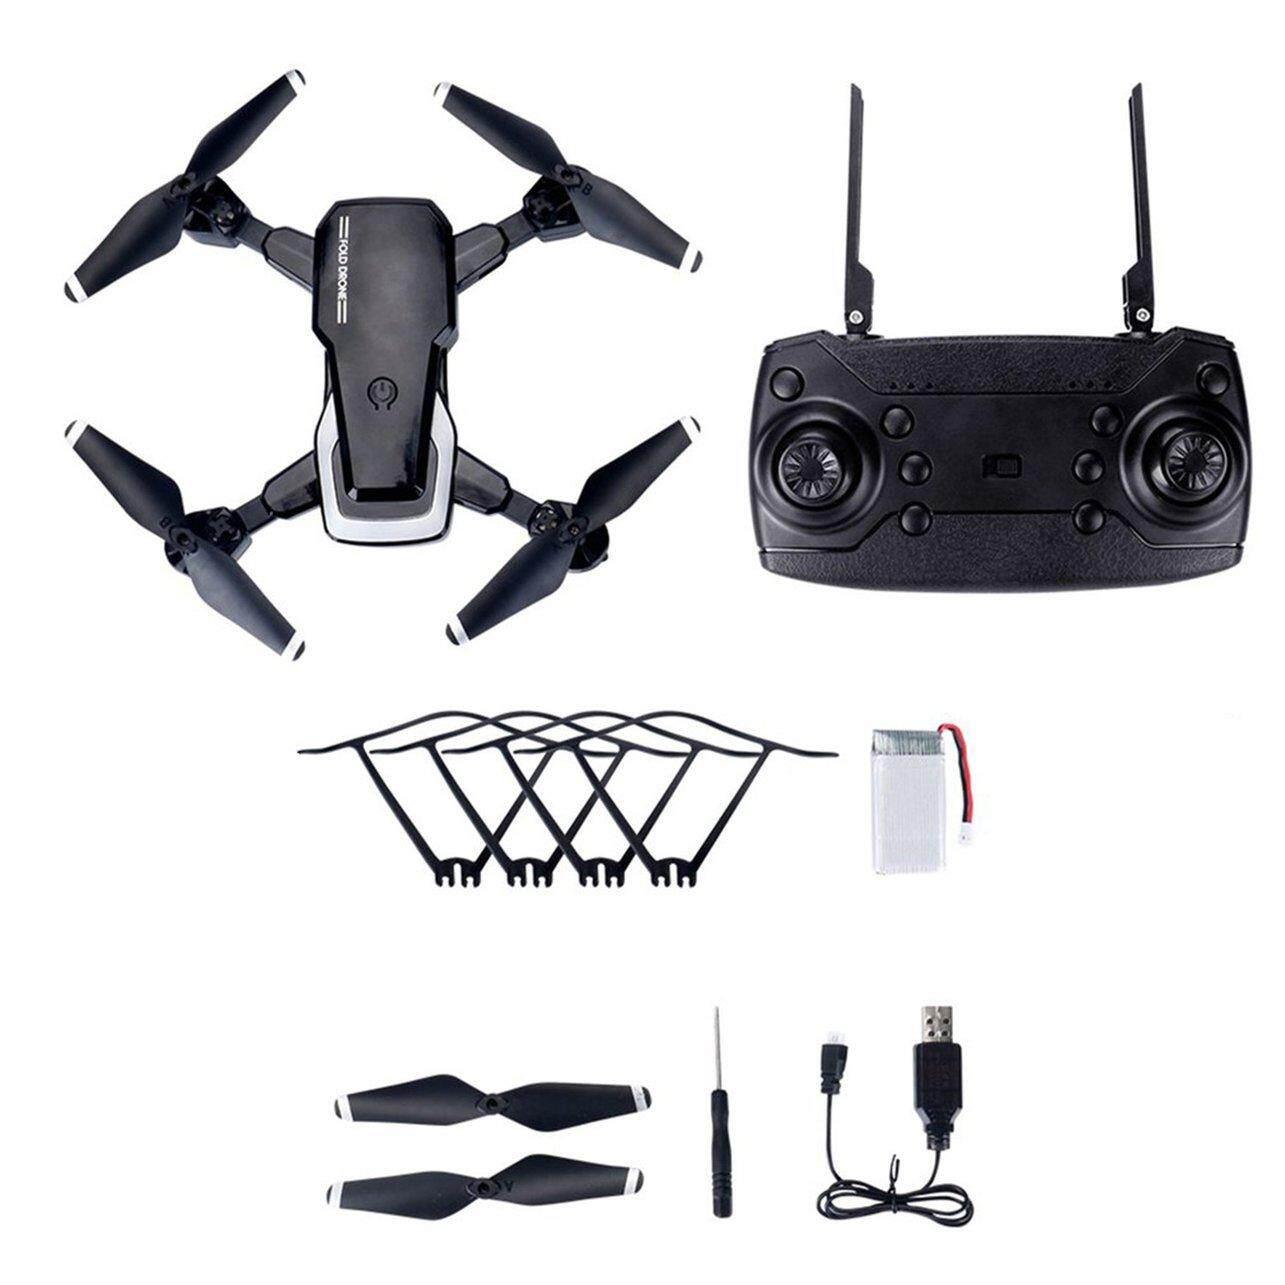 GOOD SHOP T02 LF609 2.4G 480P Foldable 3D Flip Altitude Hold Headless FPV RC Quadcopter